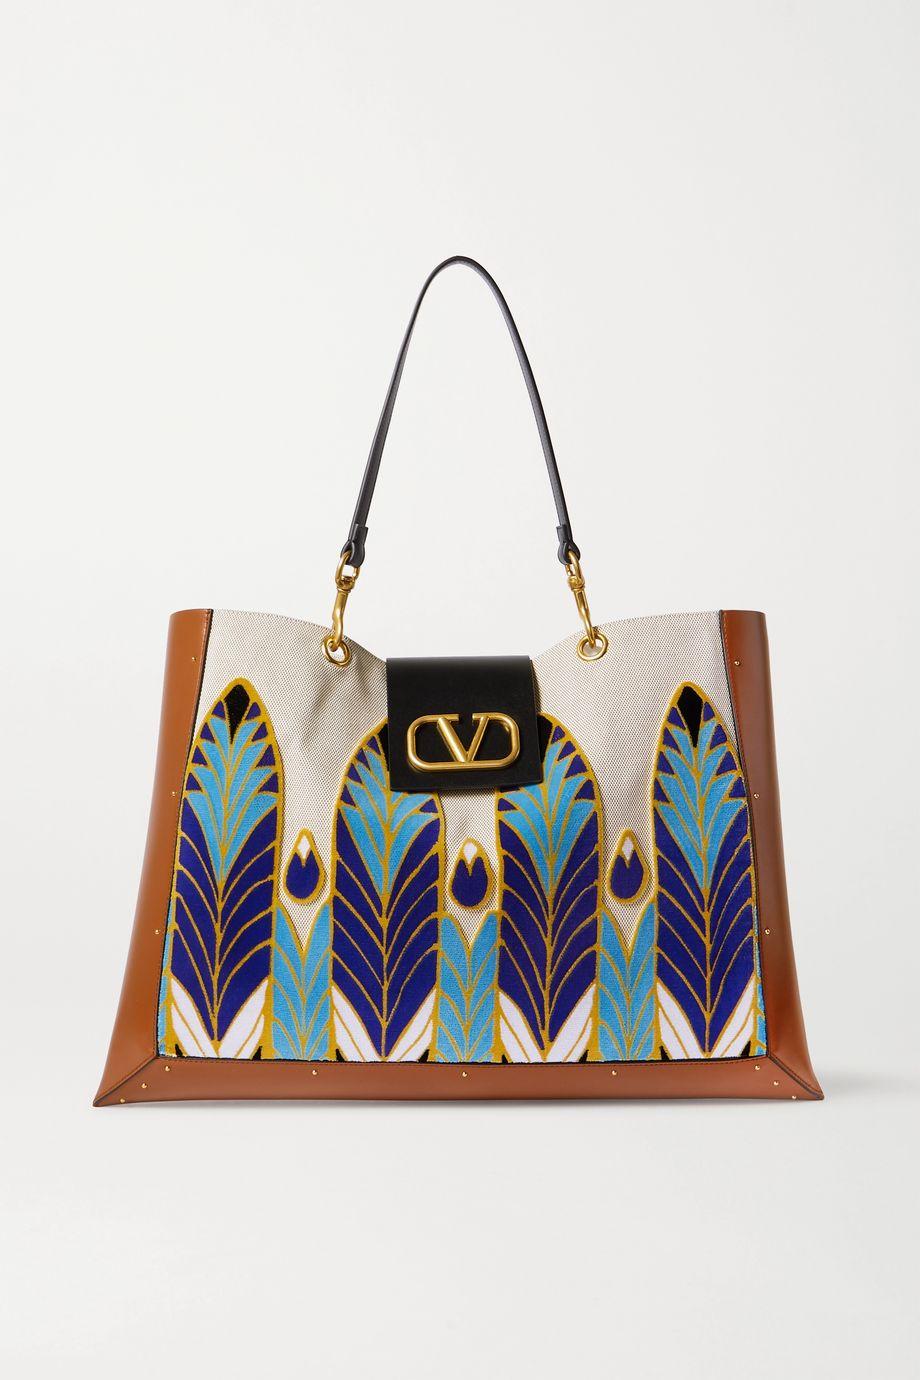 Valentino Valentino Garavani City Safari canvas, leather and velvet tote